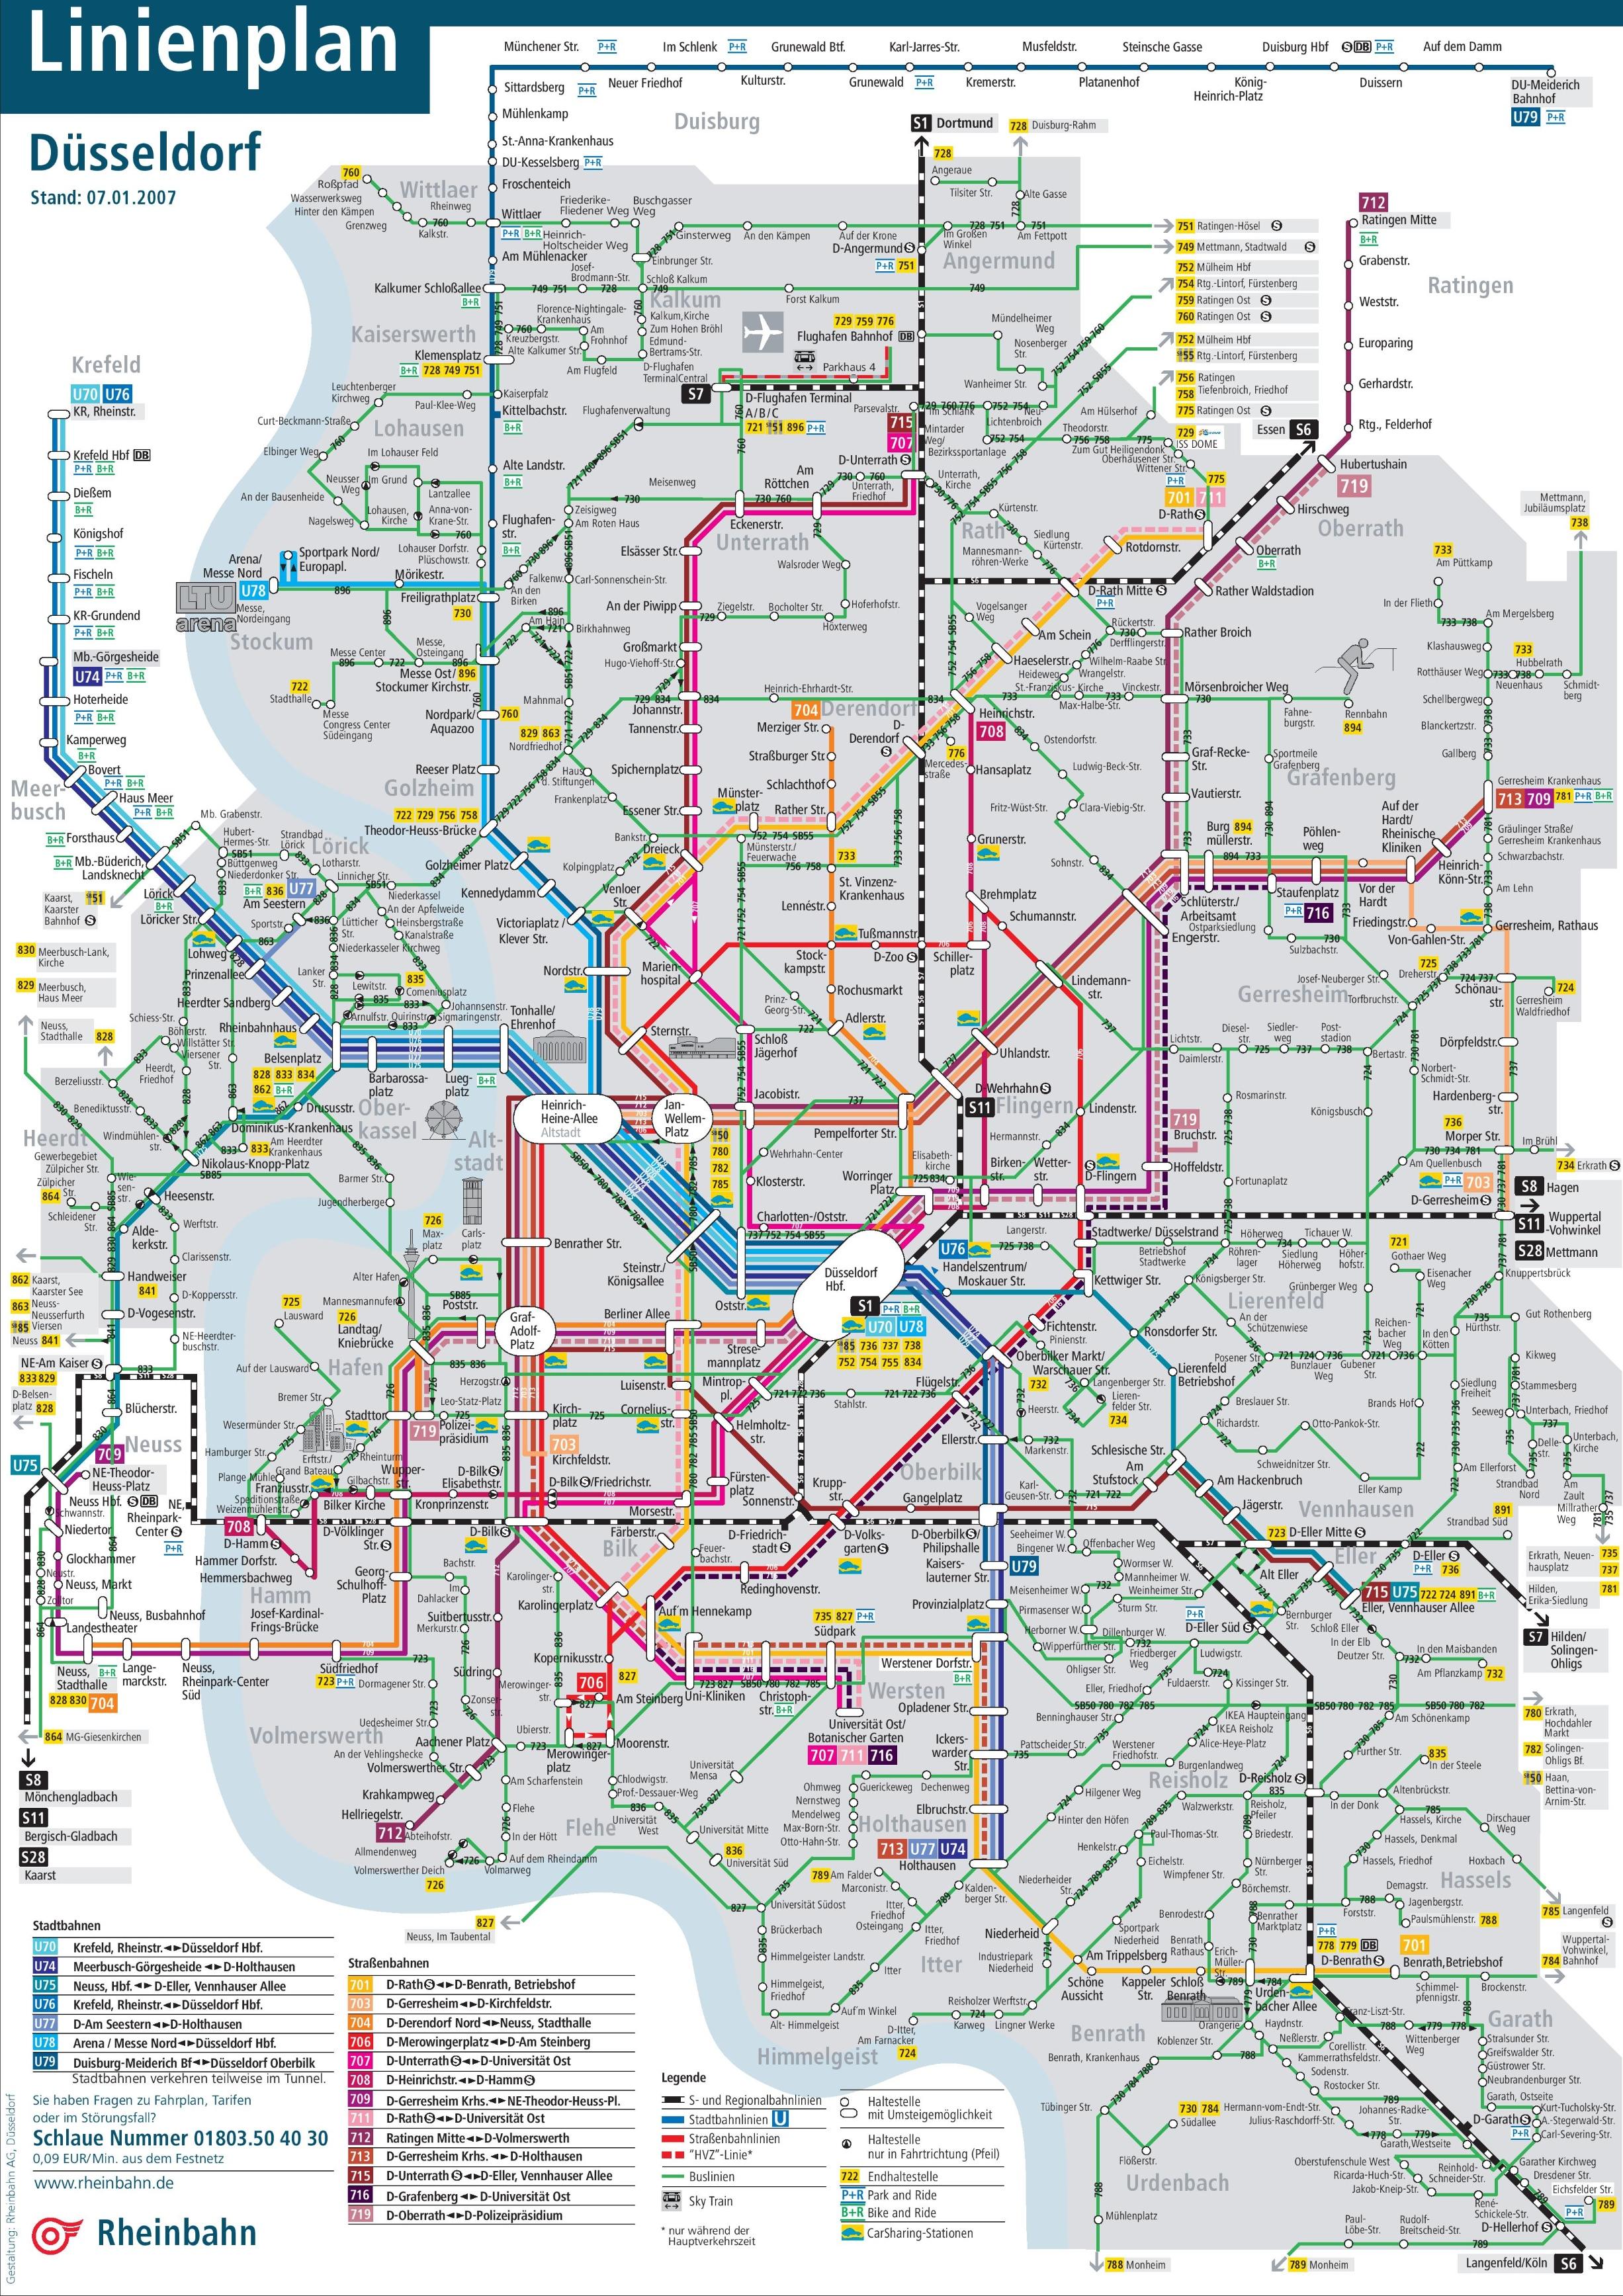 Düsseldorf Transport Map - Dusseldorf metro map